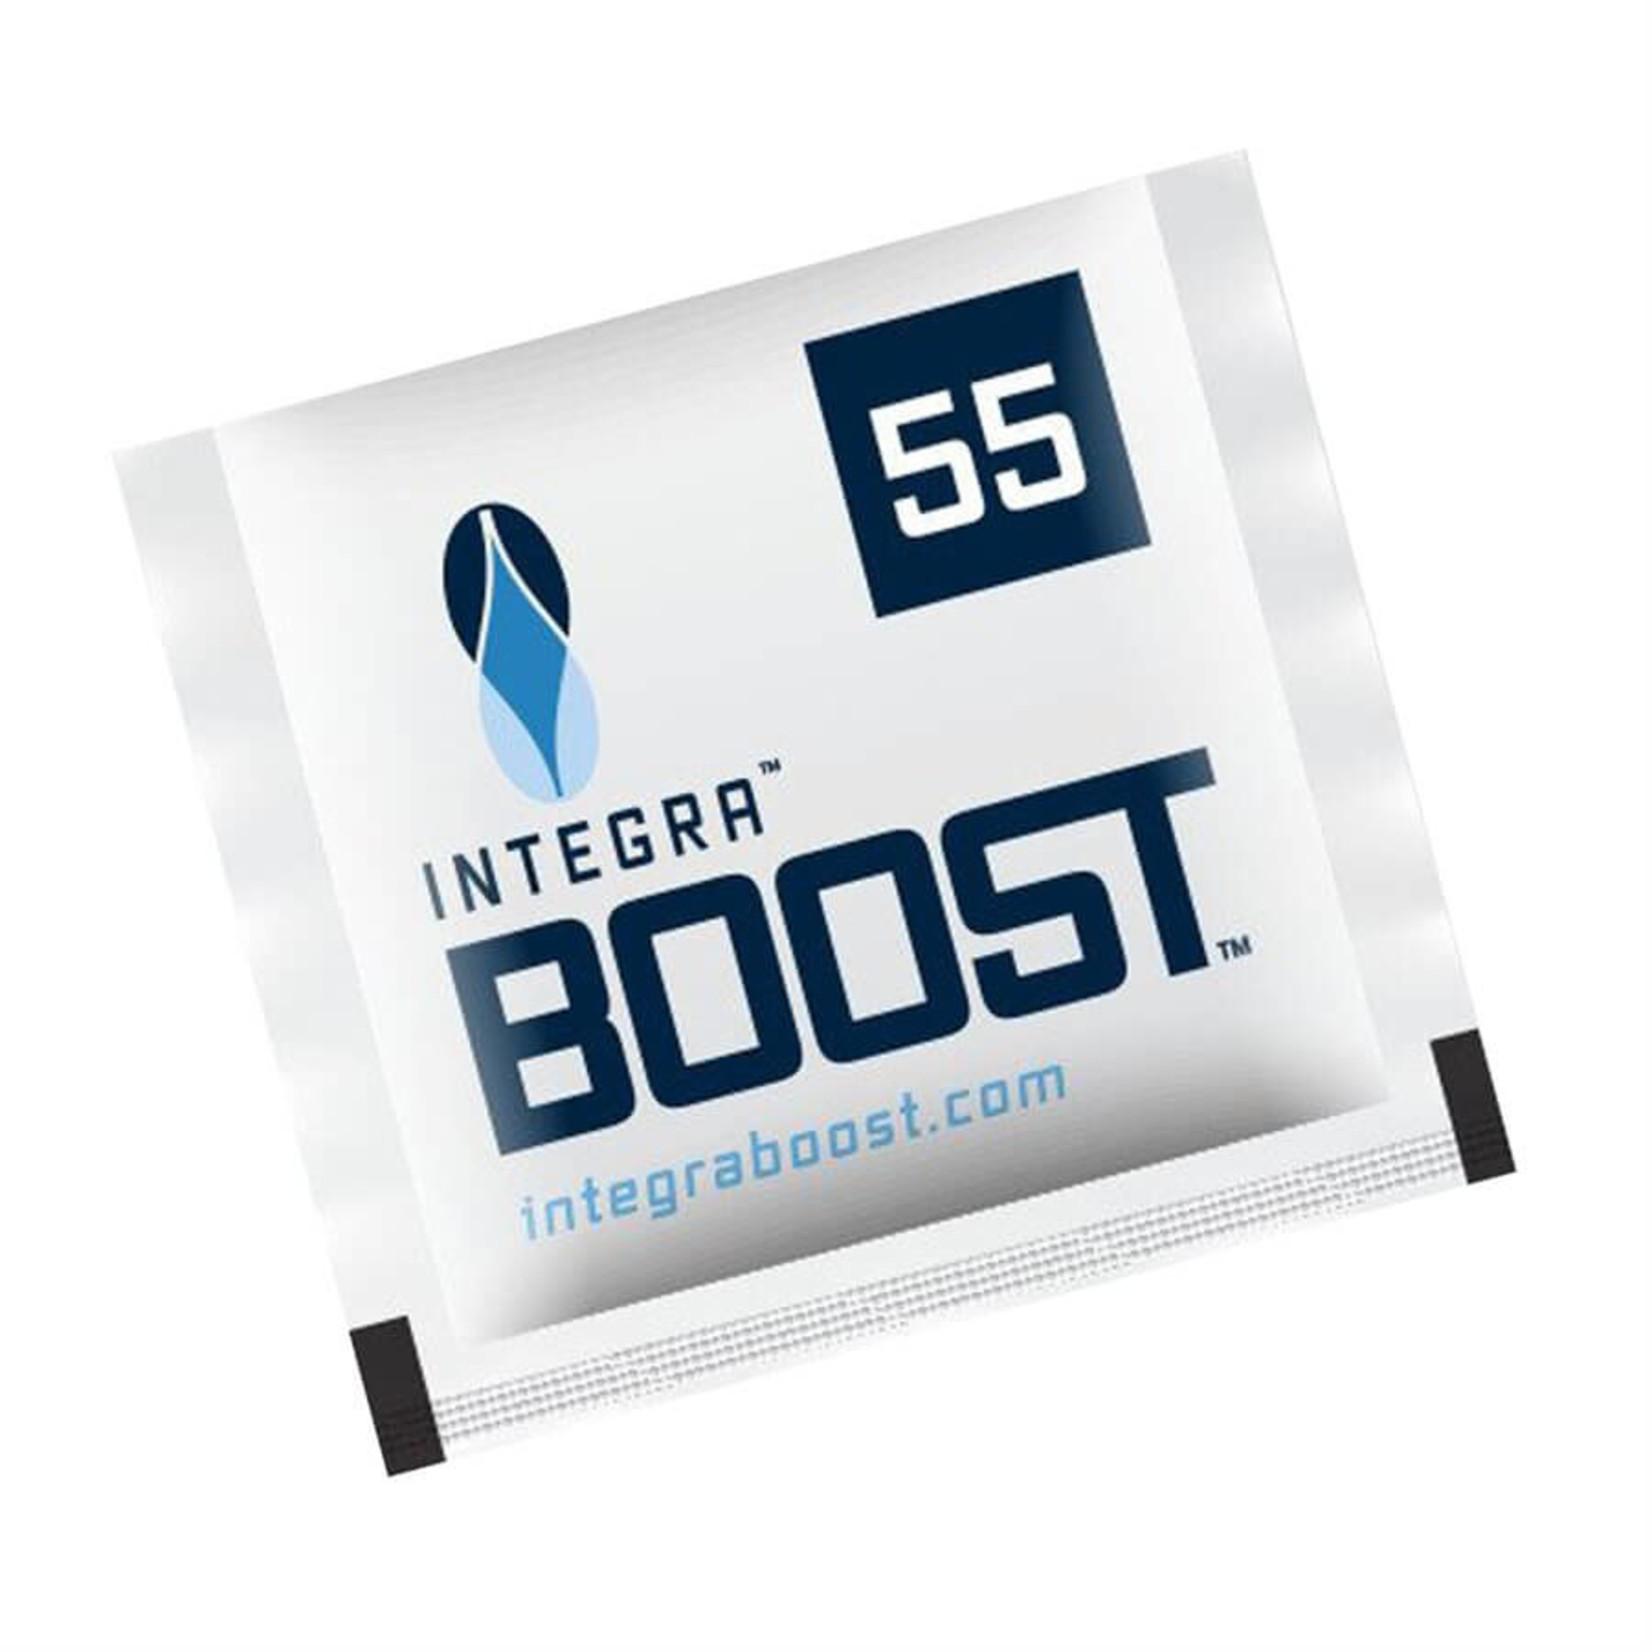 integra INTEGRA BOOST HUMIDITY REGULATOR RH55%